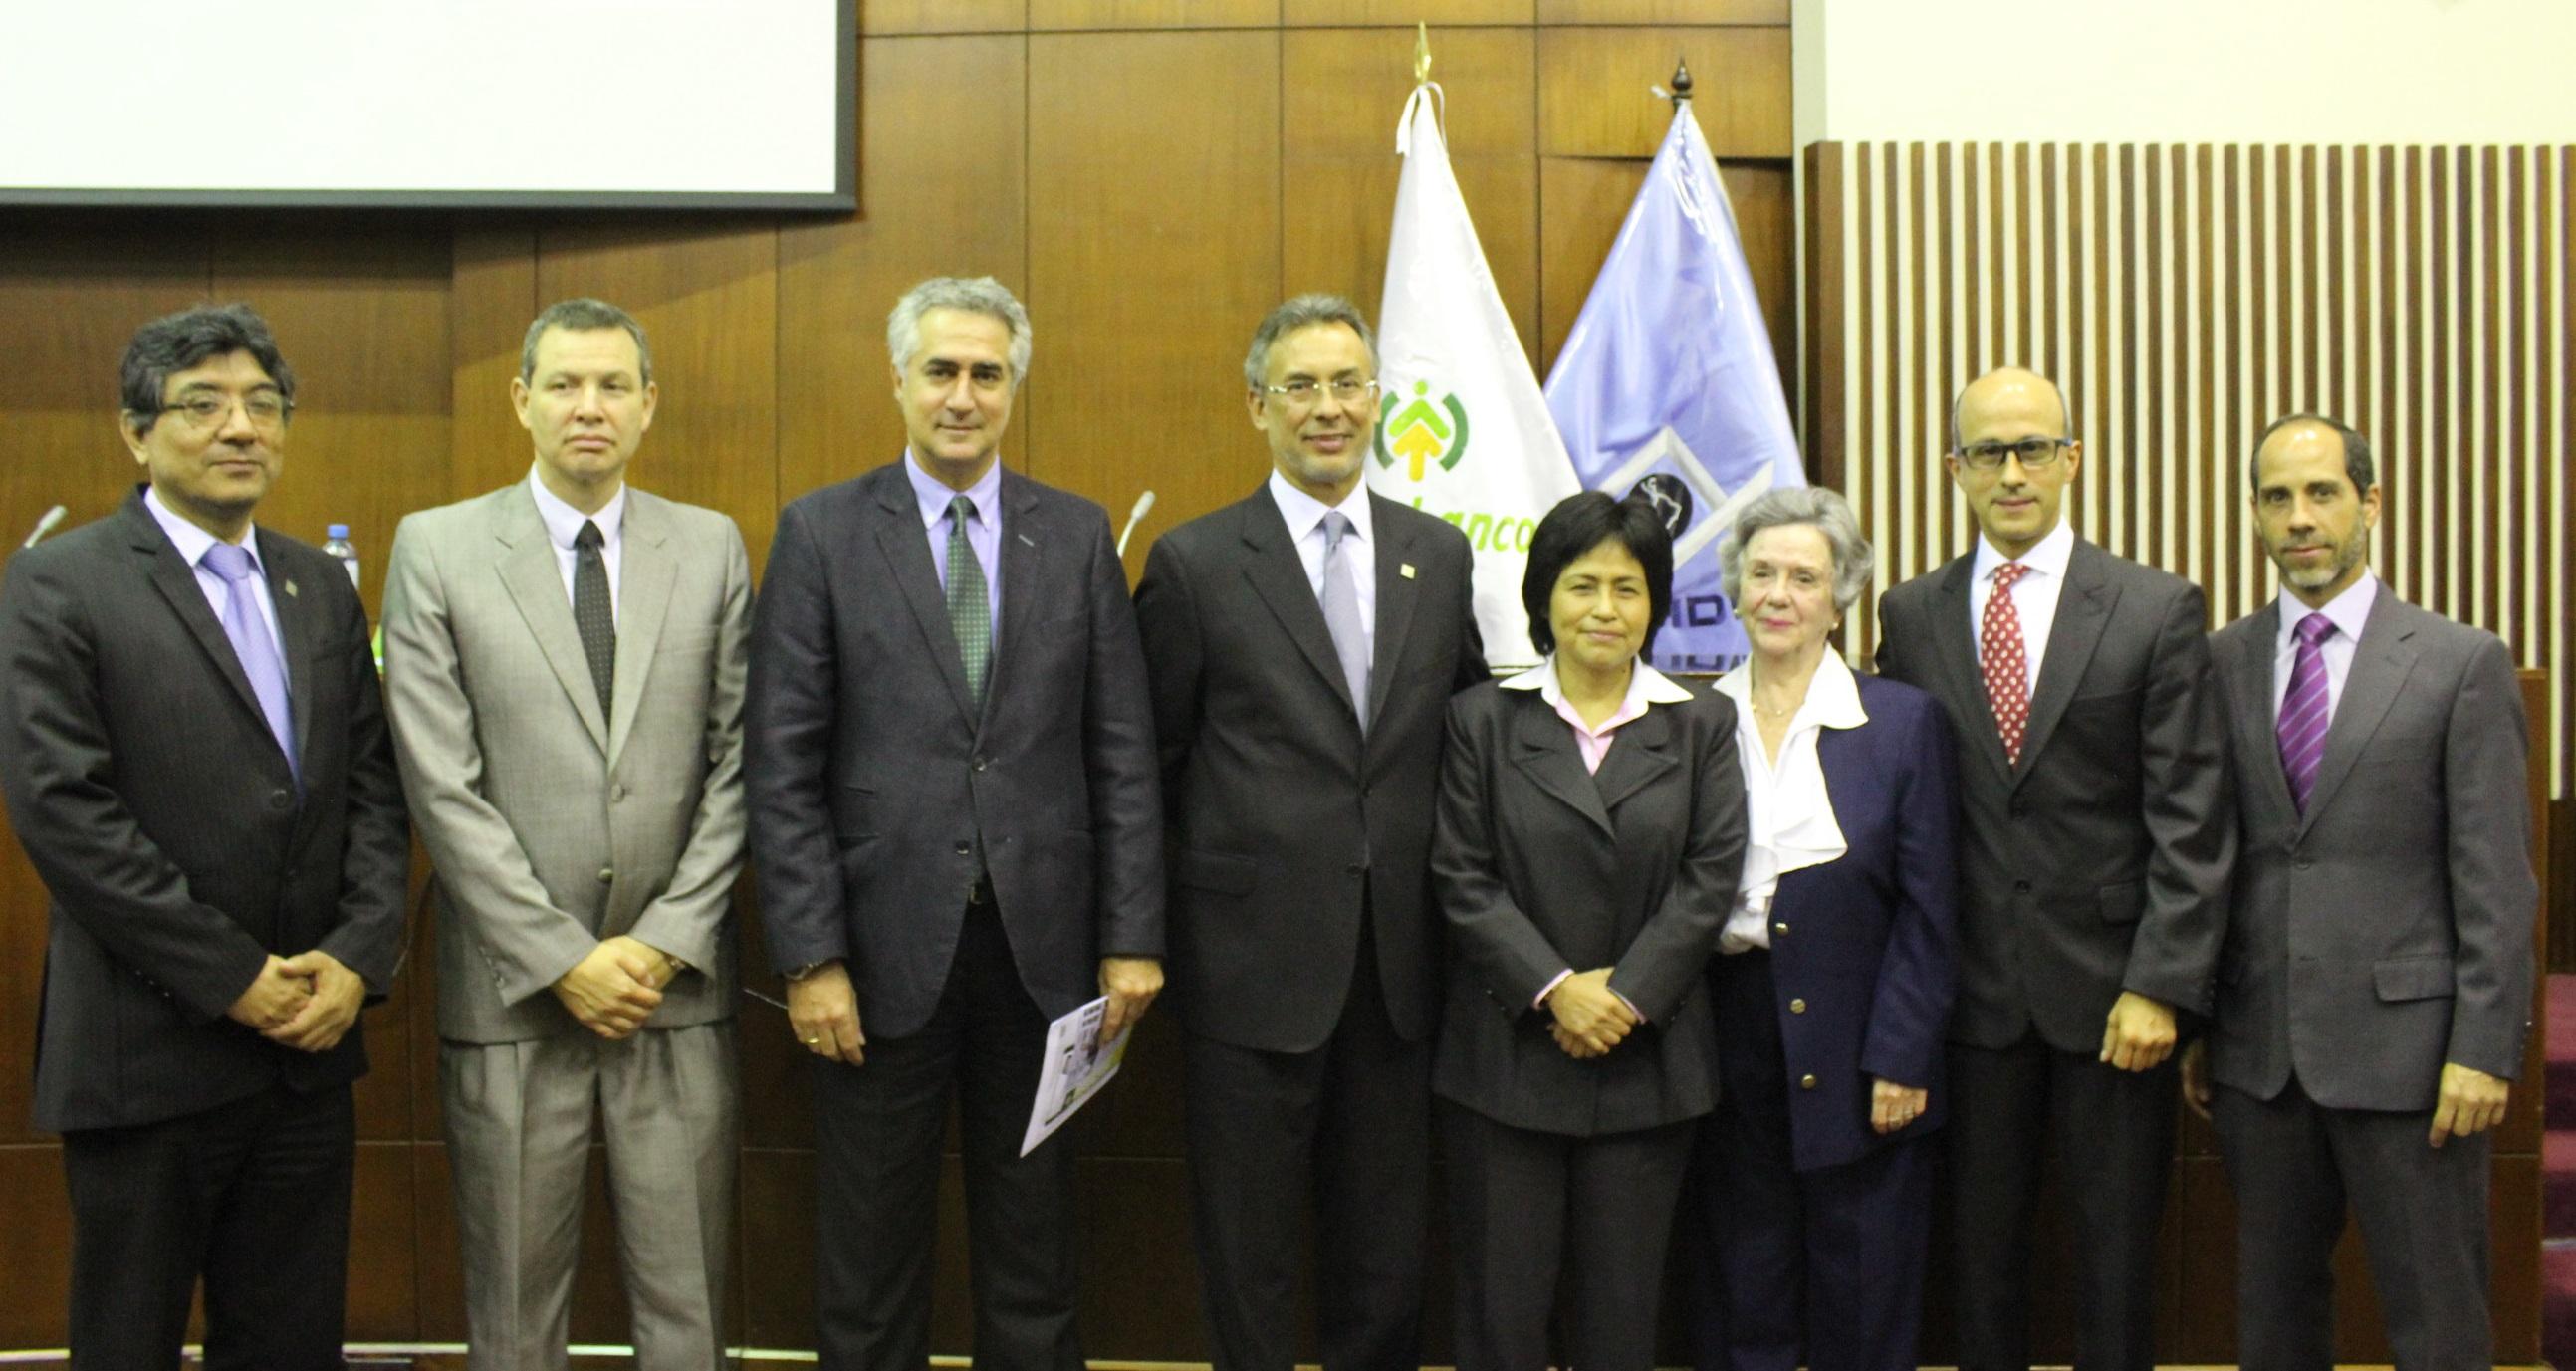 Banco do Nordeste do Brasil fue reconocido con el Premio Agrobanco 2017